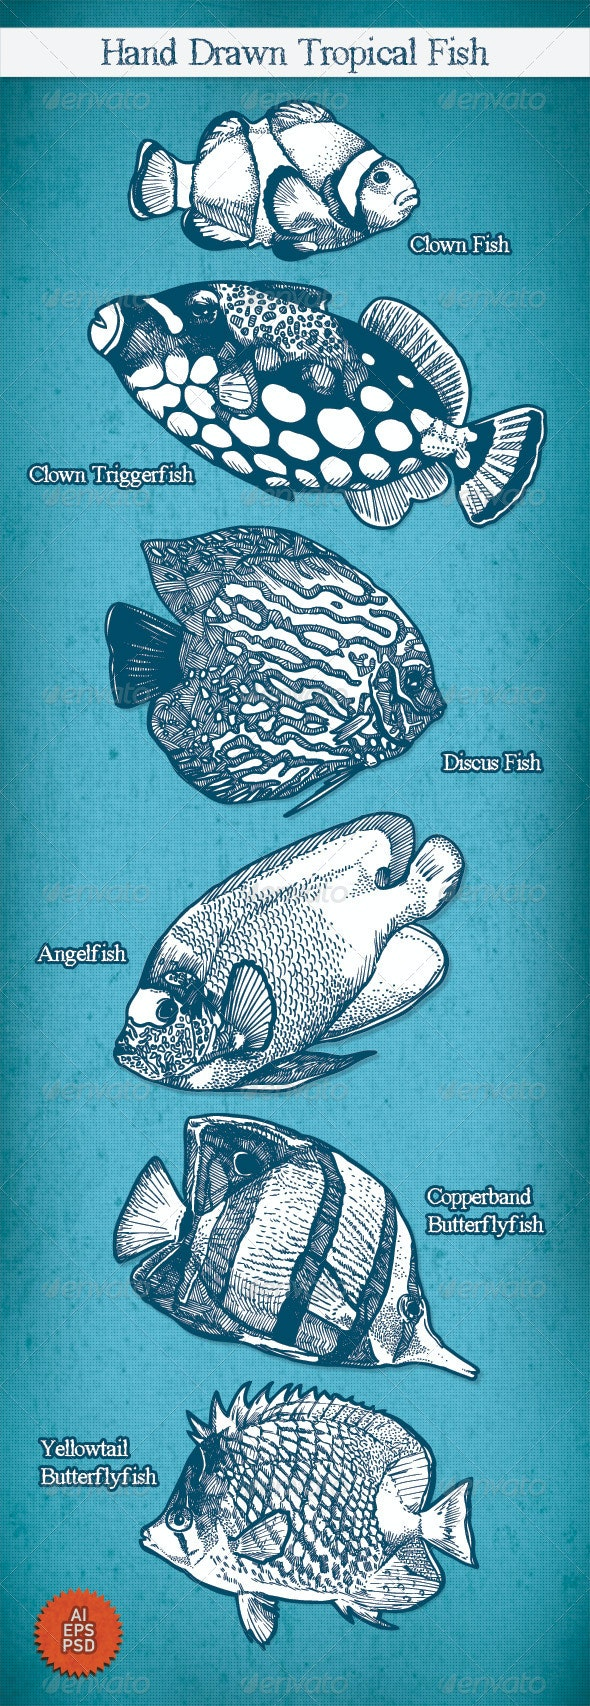 Hand Drawn Tropical Fish - Animals Characters